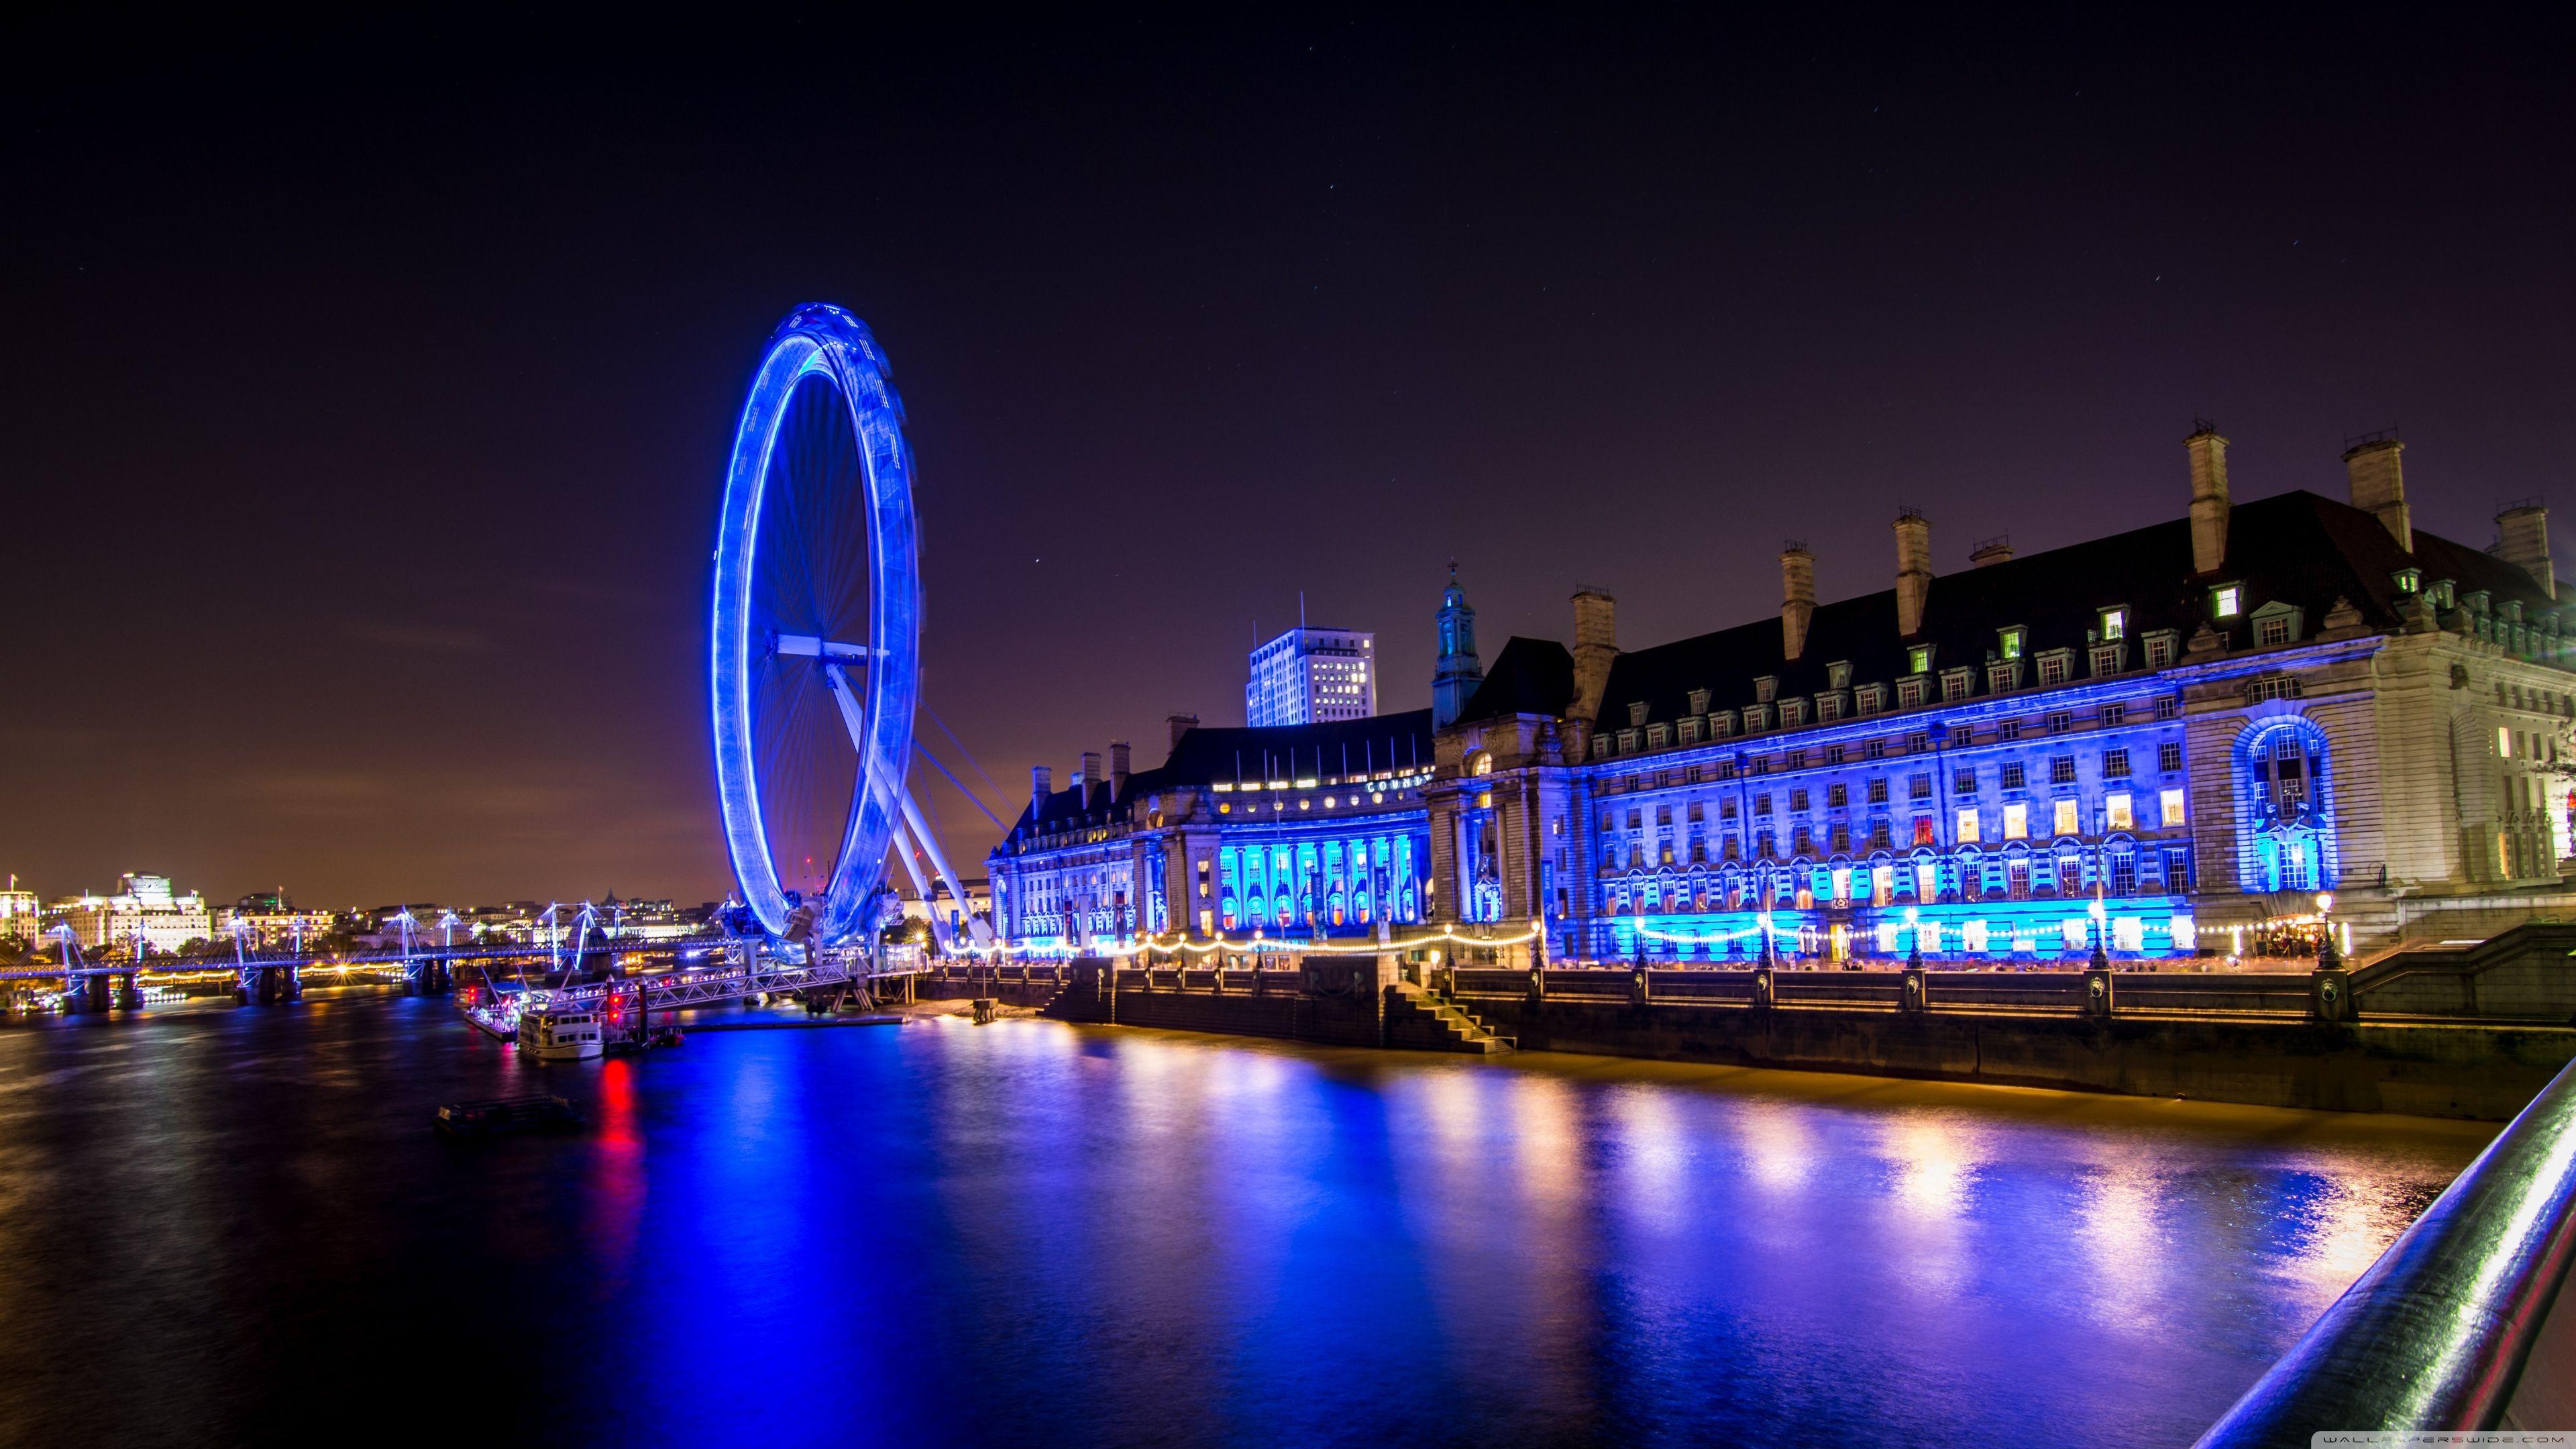 Ferris Wheel In London Hd Desktop Wallpaper Widescreen High London Wallpaper London Night Visiting England